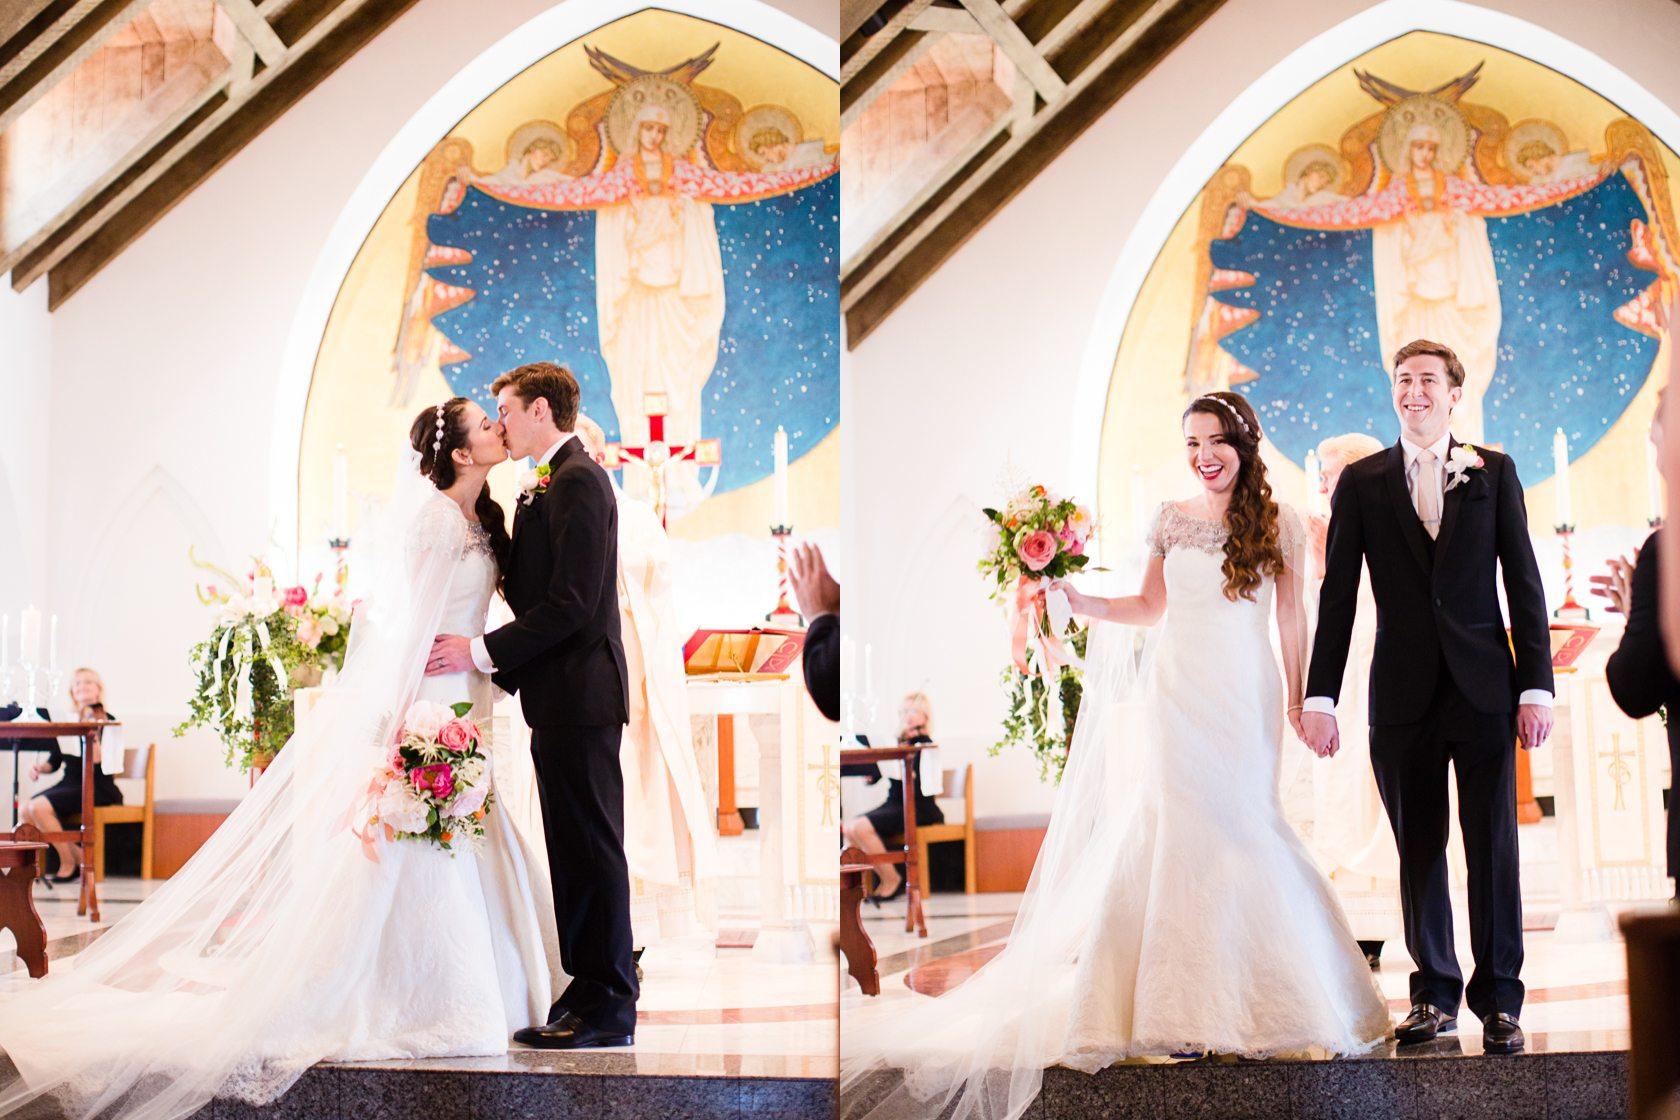 Darlington_House_Wedding_070.jpg